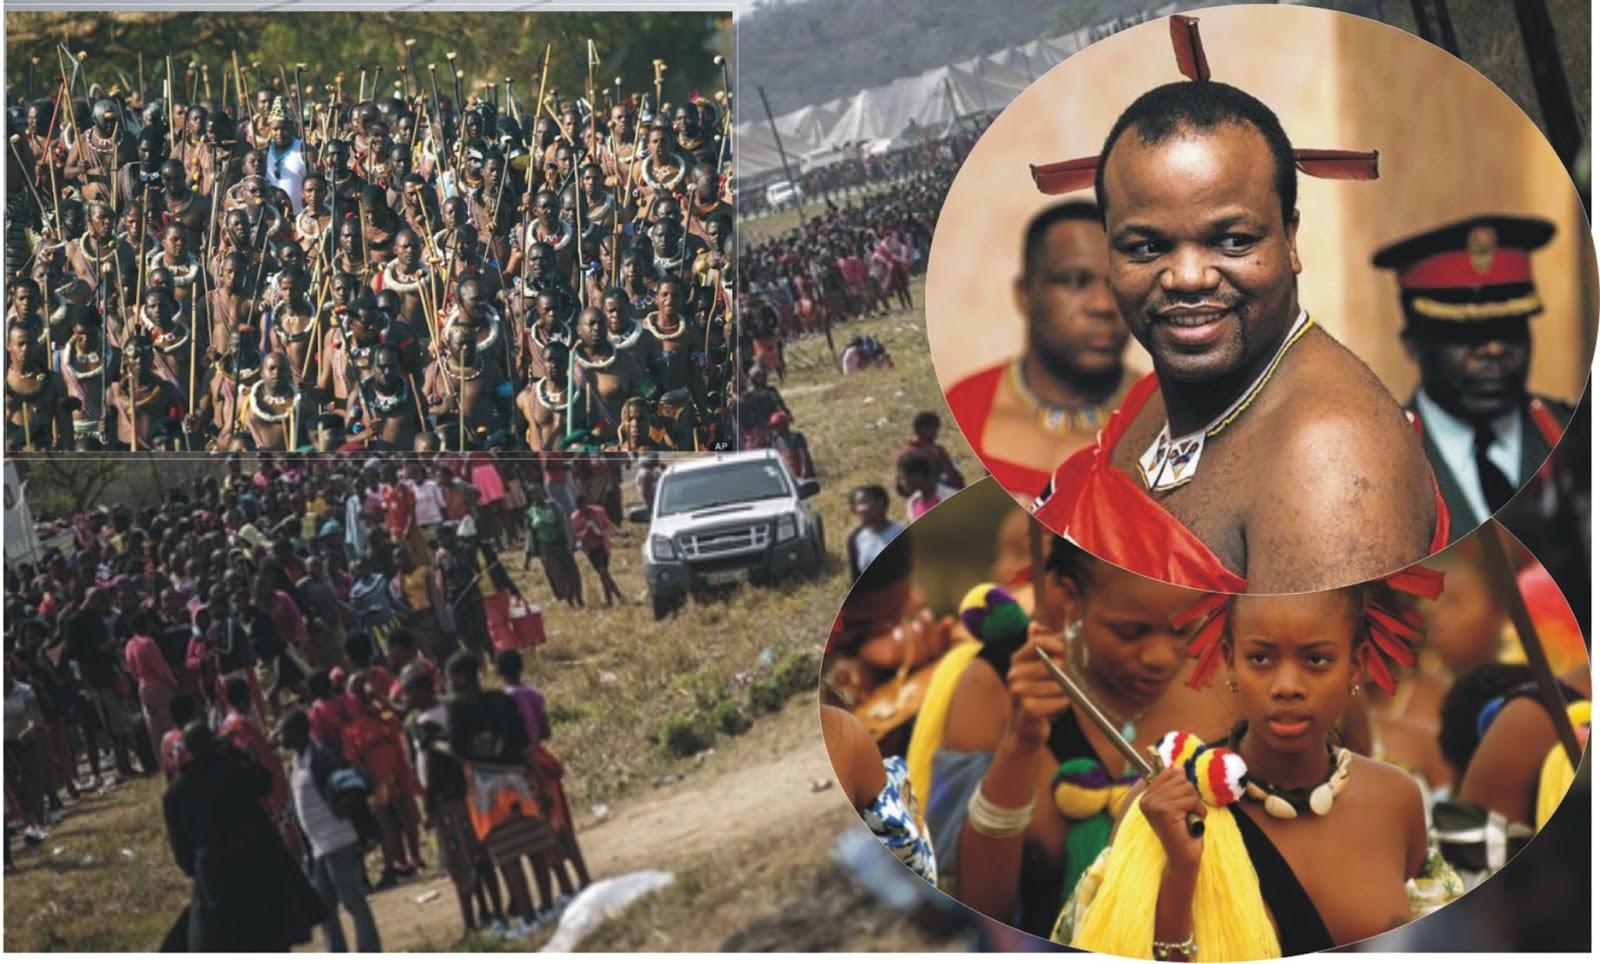 swaziland woman